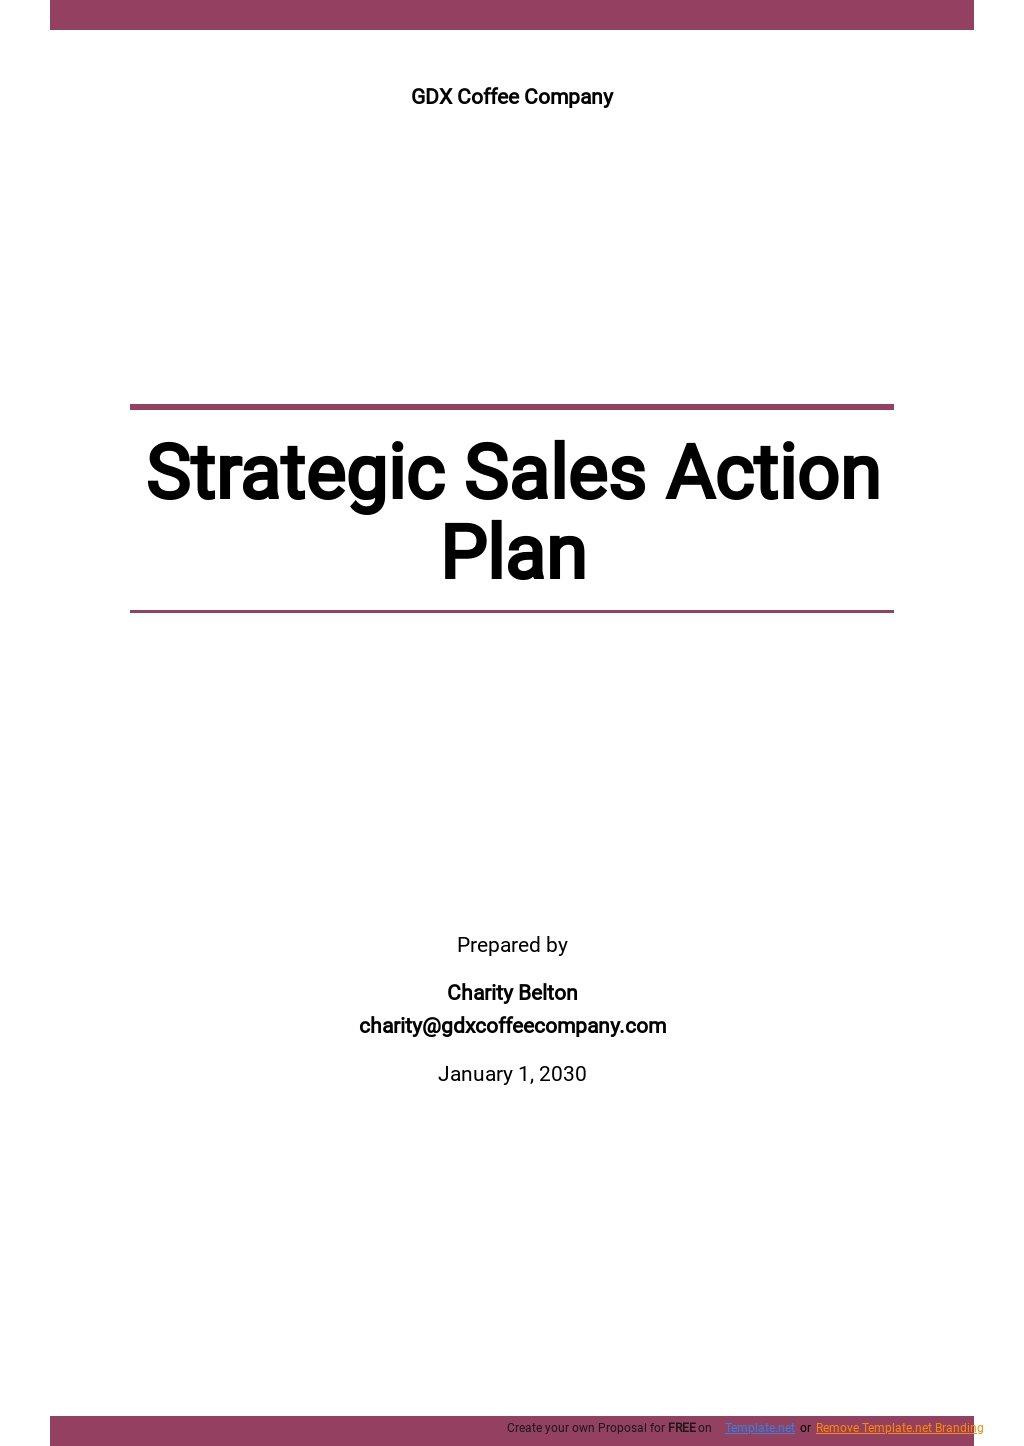 Strategic Sales Action Plan Template.jpe